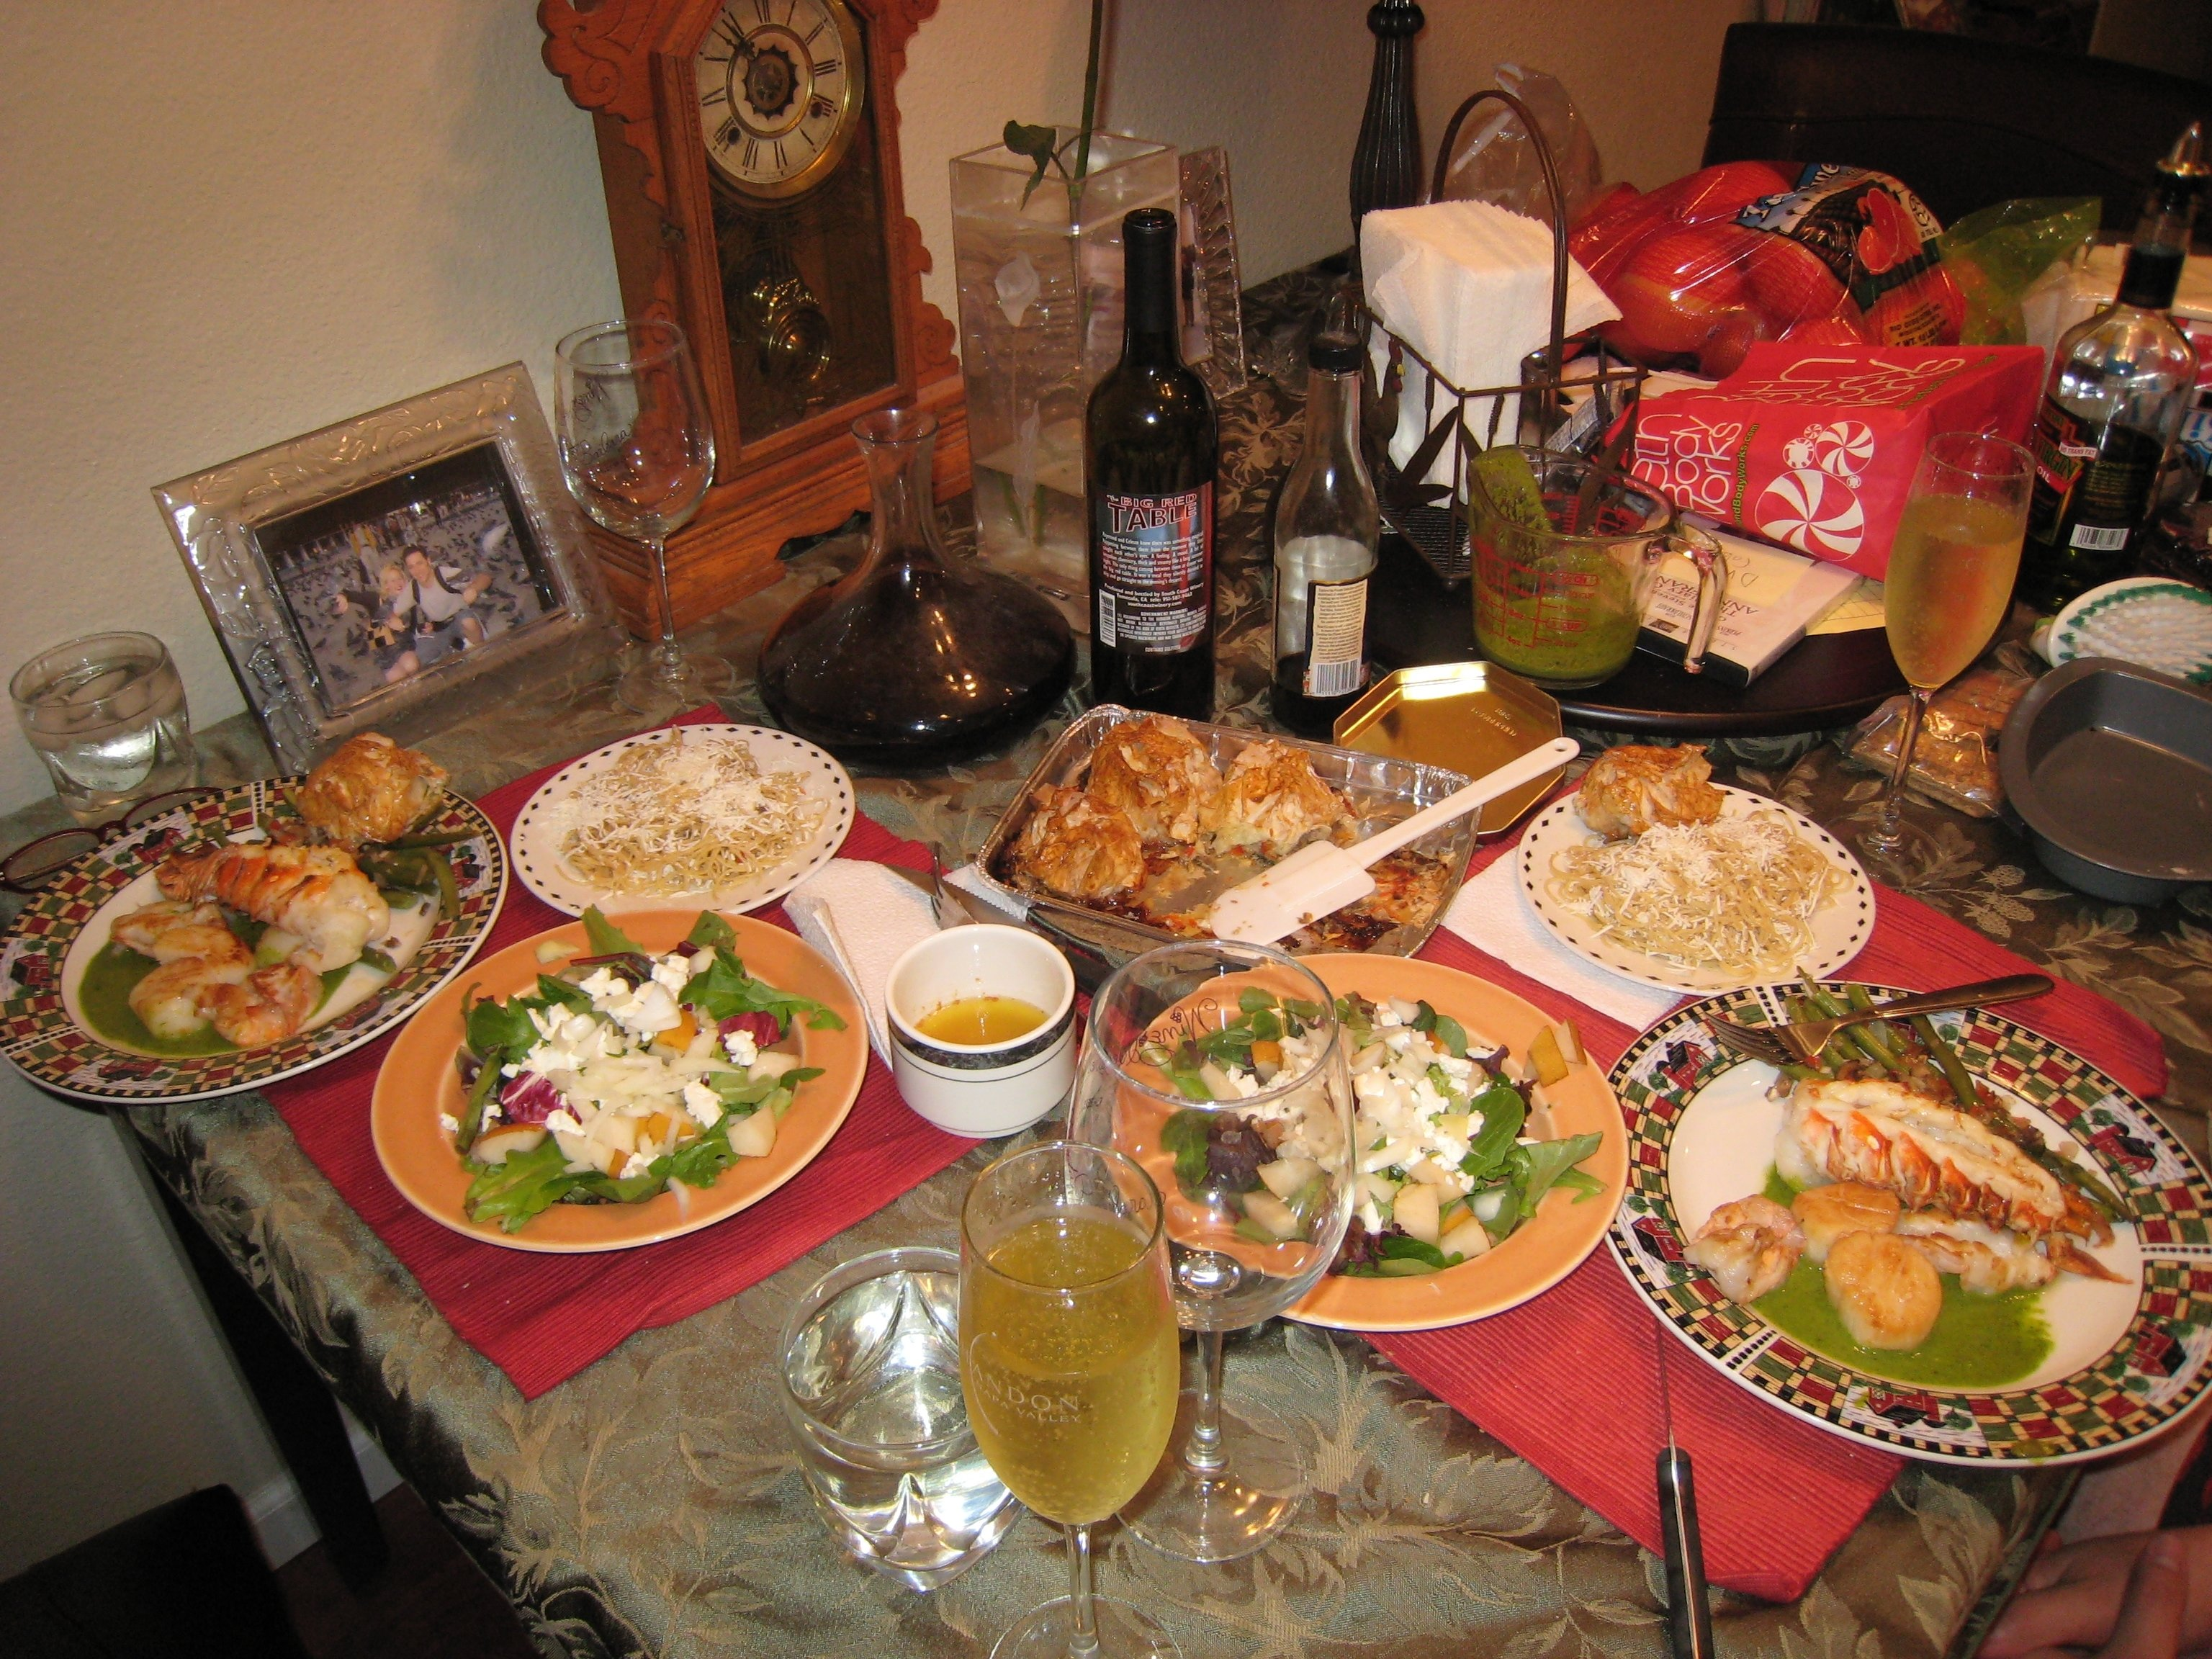 10 Stylish Romantic Valentines Day Dinner Ideas dinner ideas for valentines day at home http www 2021